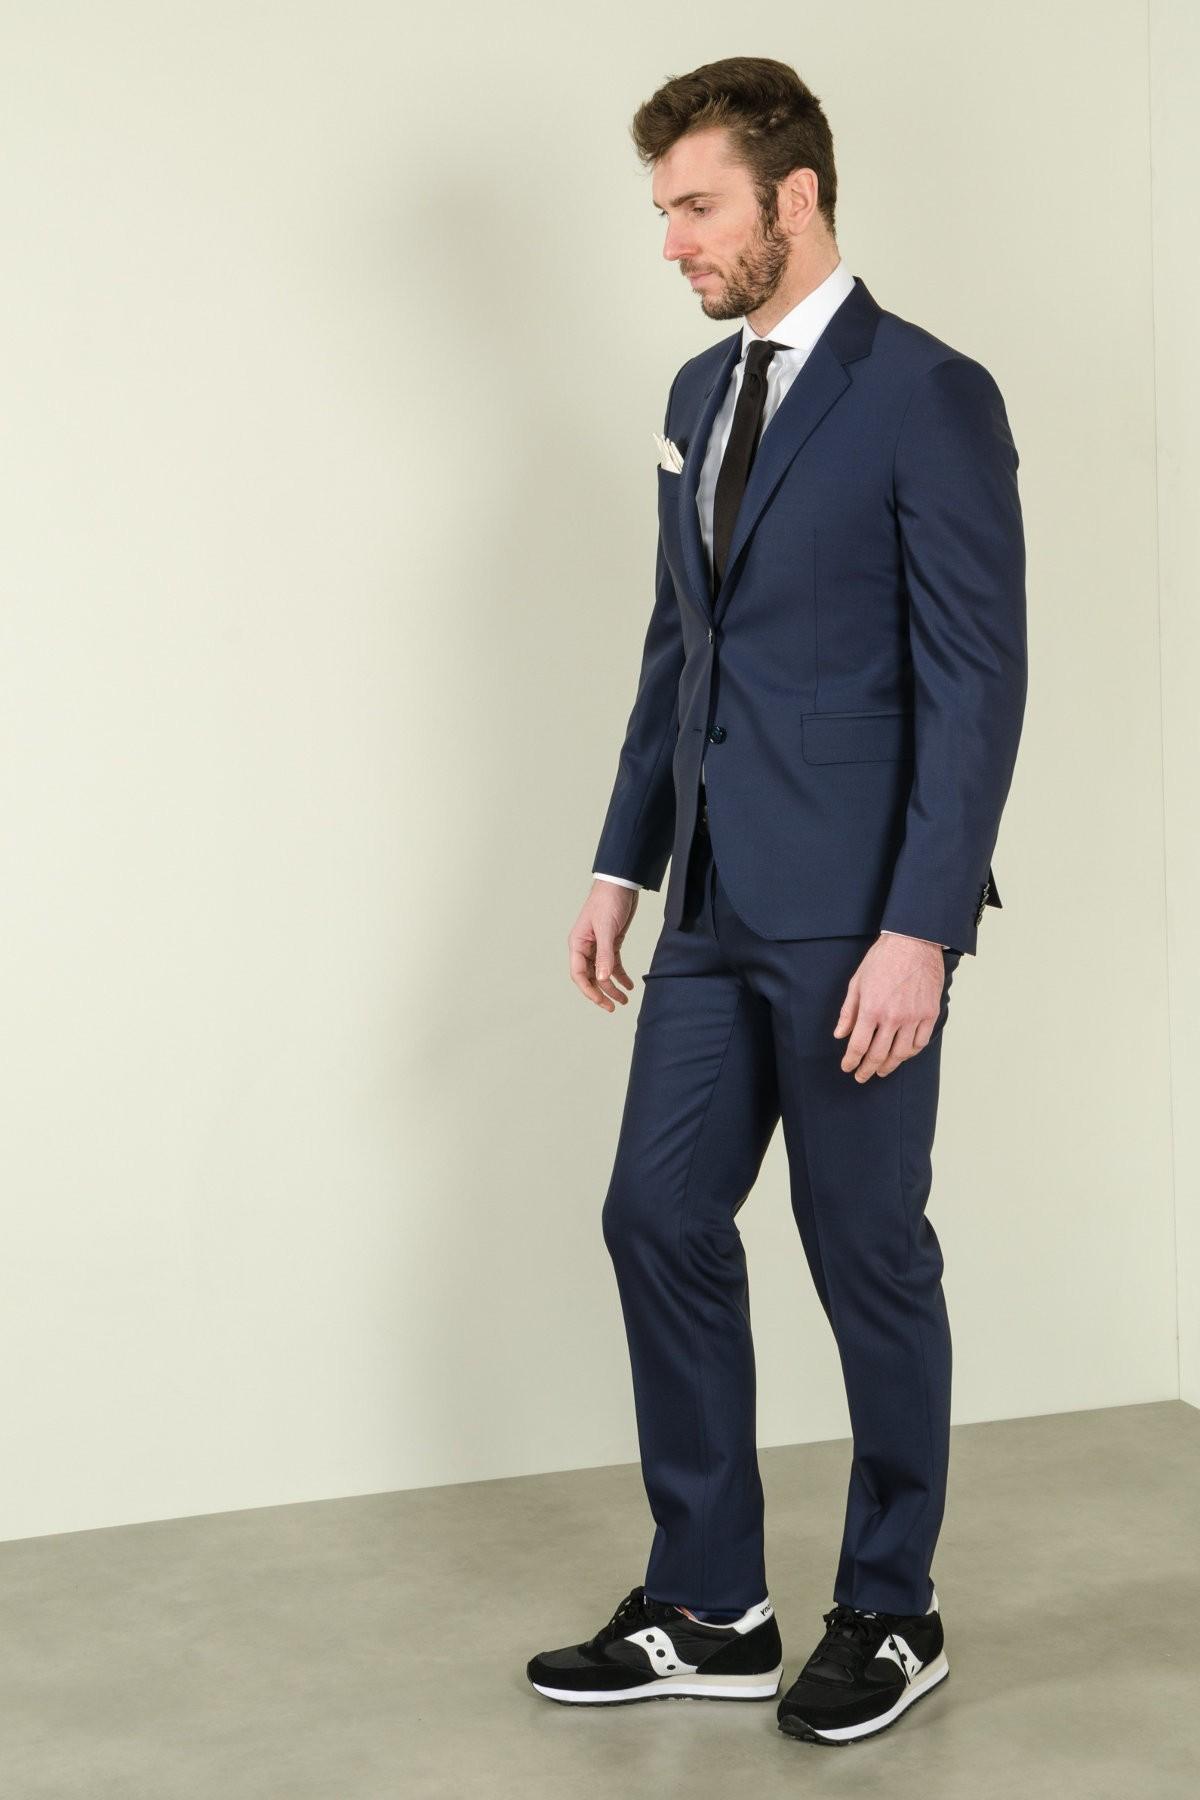 pantalone e giacca uomo